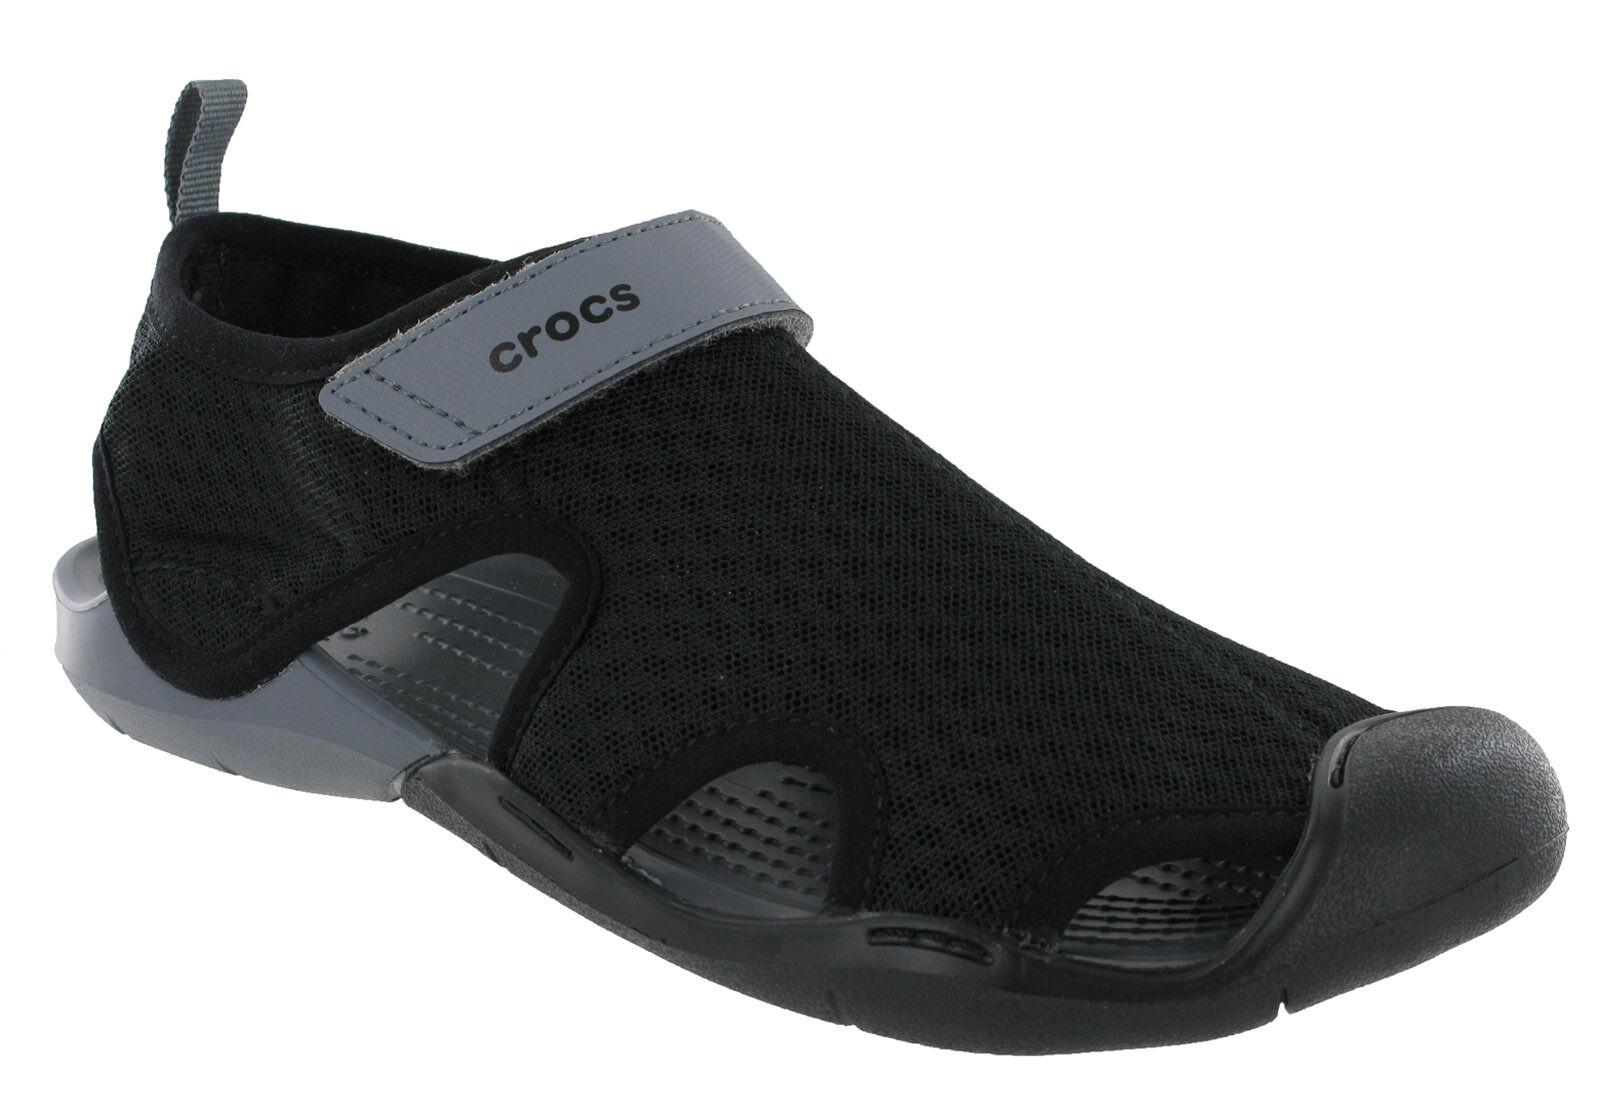 8fa3d6432c66 Crocs Women s Swiftwater Mesh Sandals US 11 Smoke for sale online